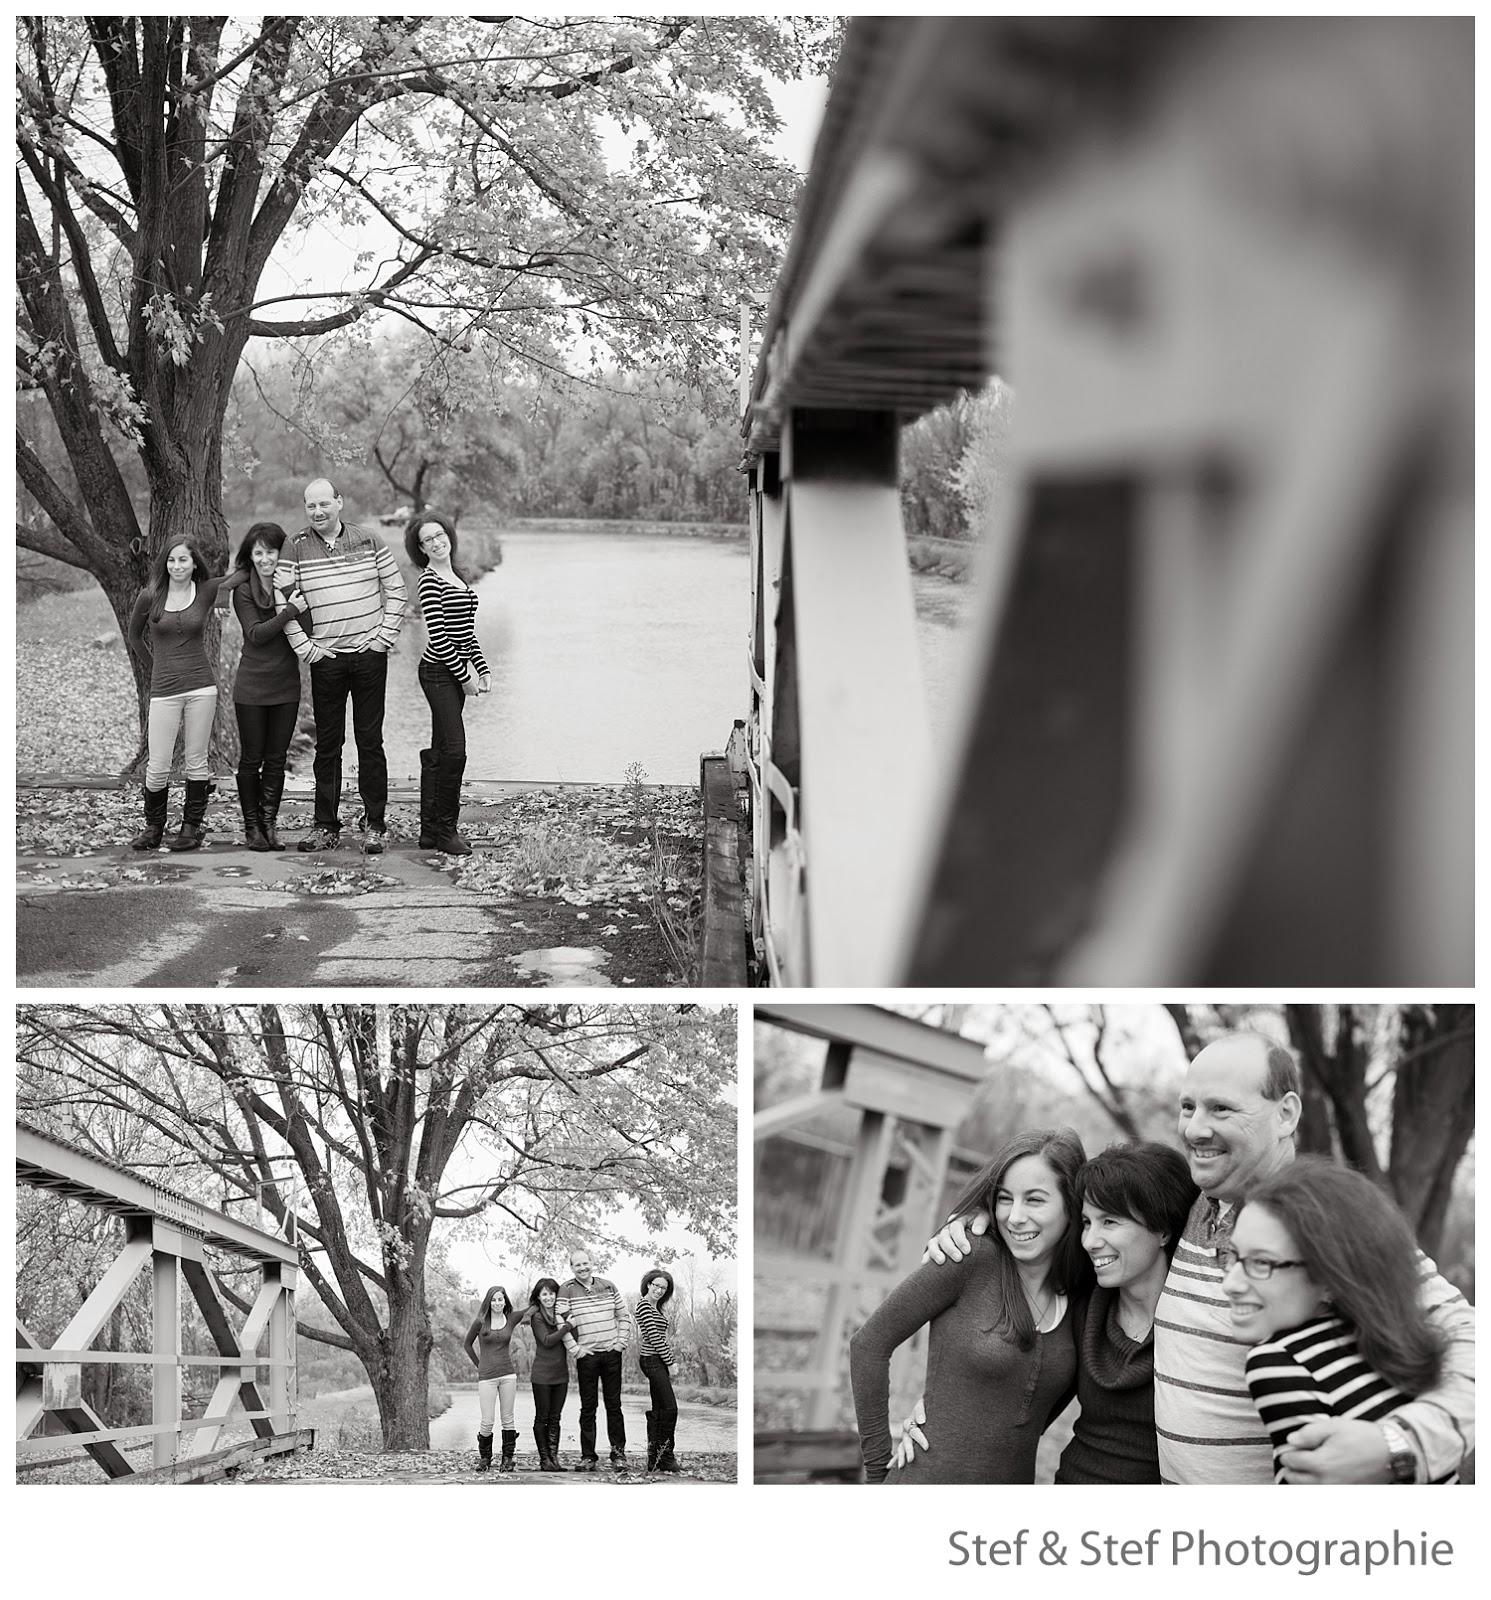 portrait famille photographe montreal